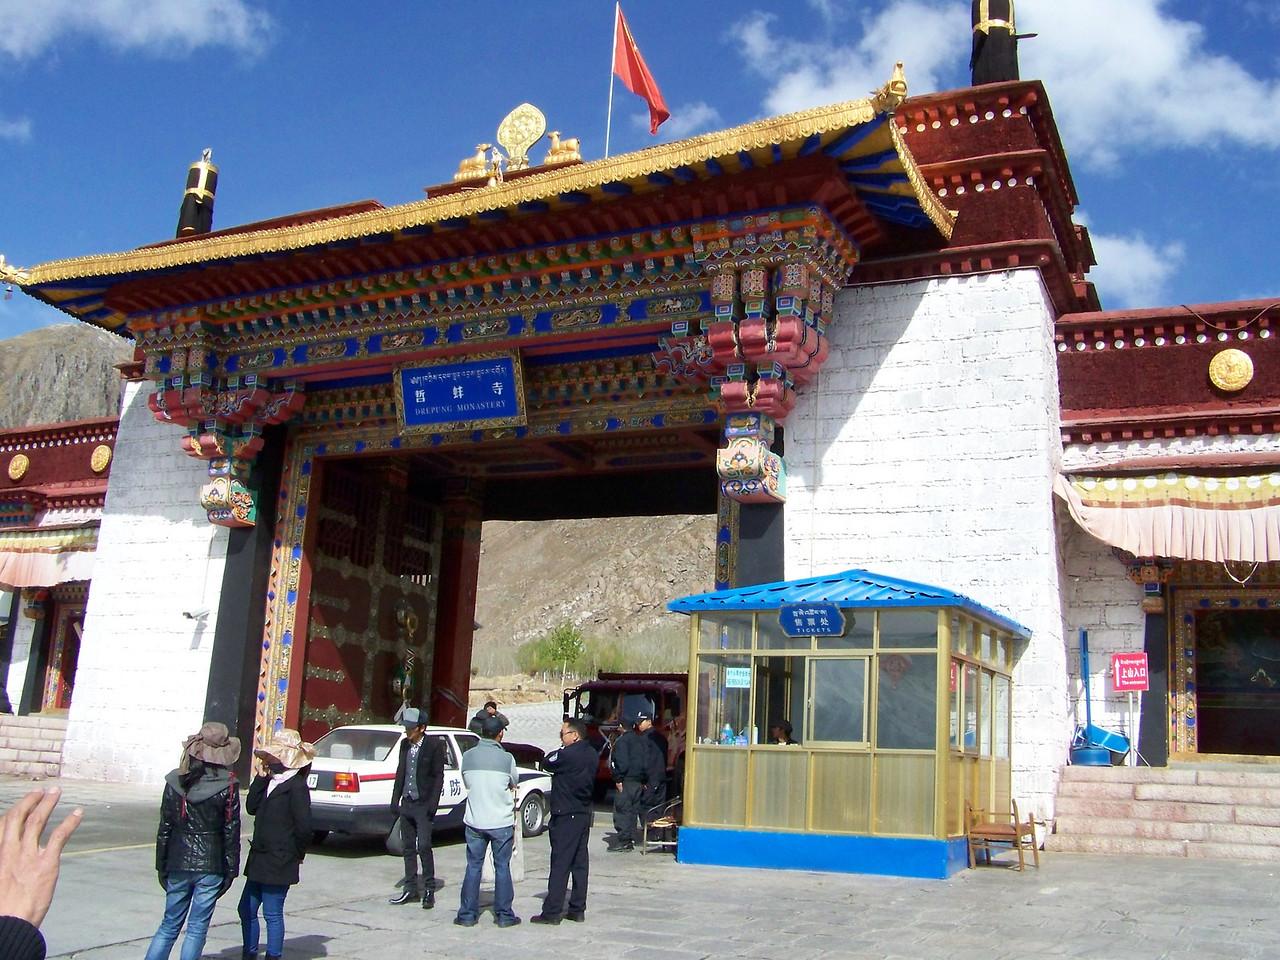 0127 - Entrance to Deprung Monastery - Lhasa Tibet.JPG